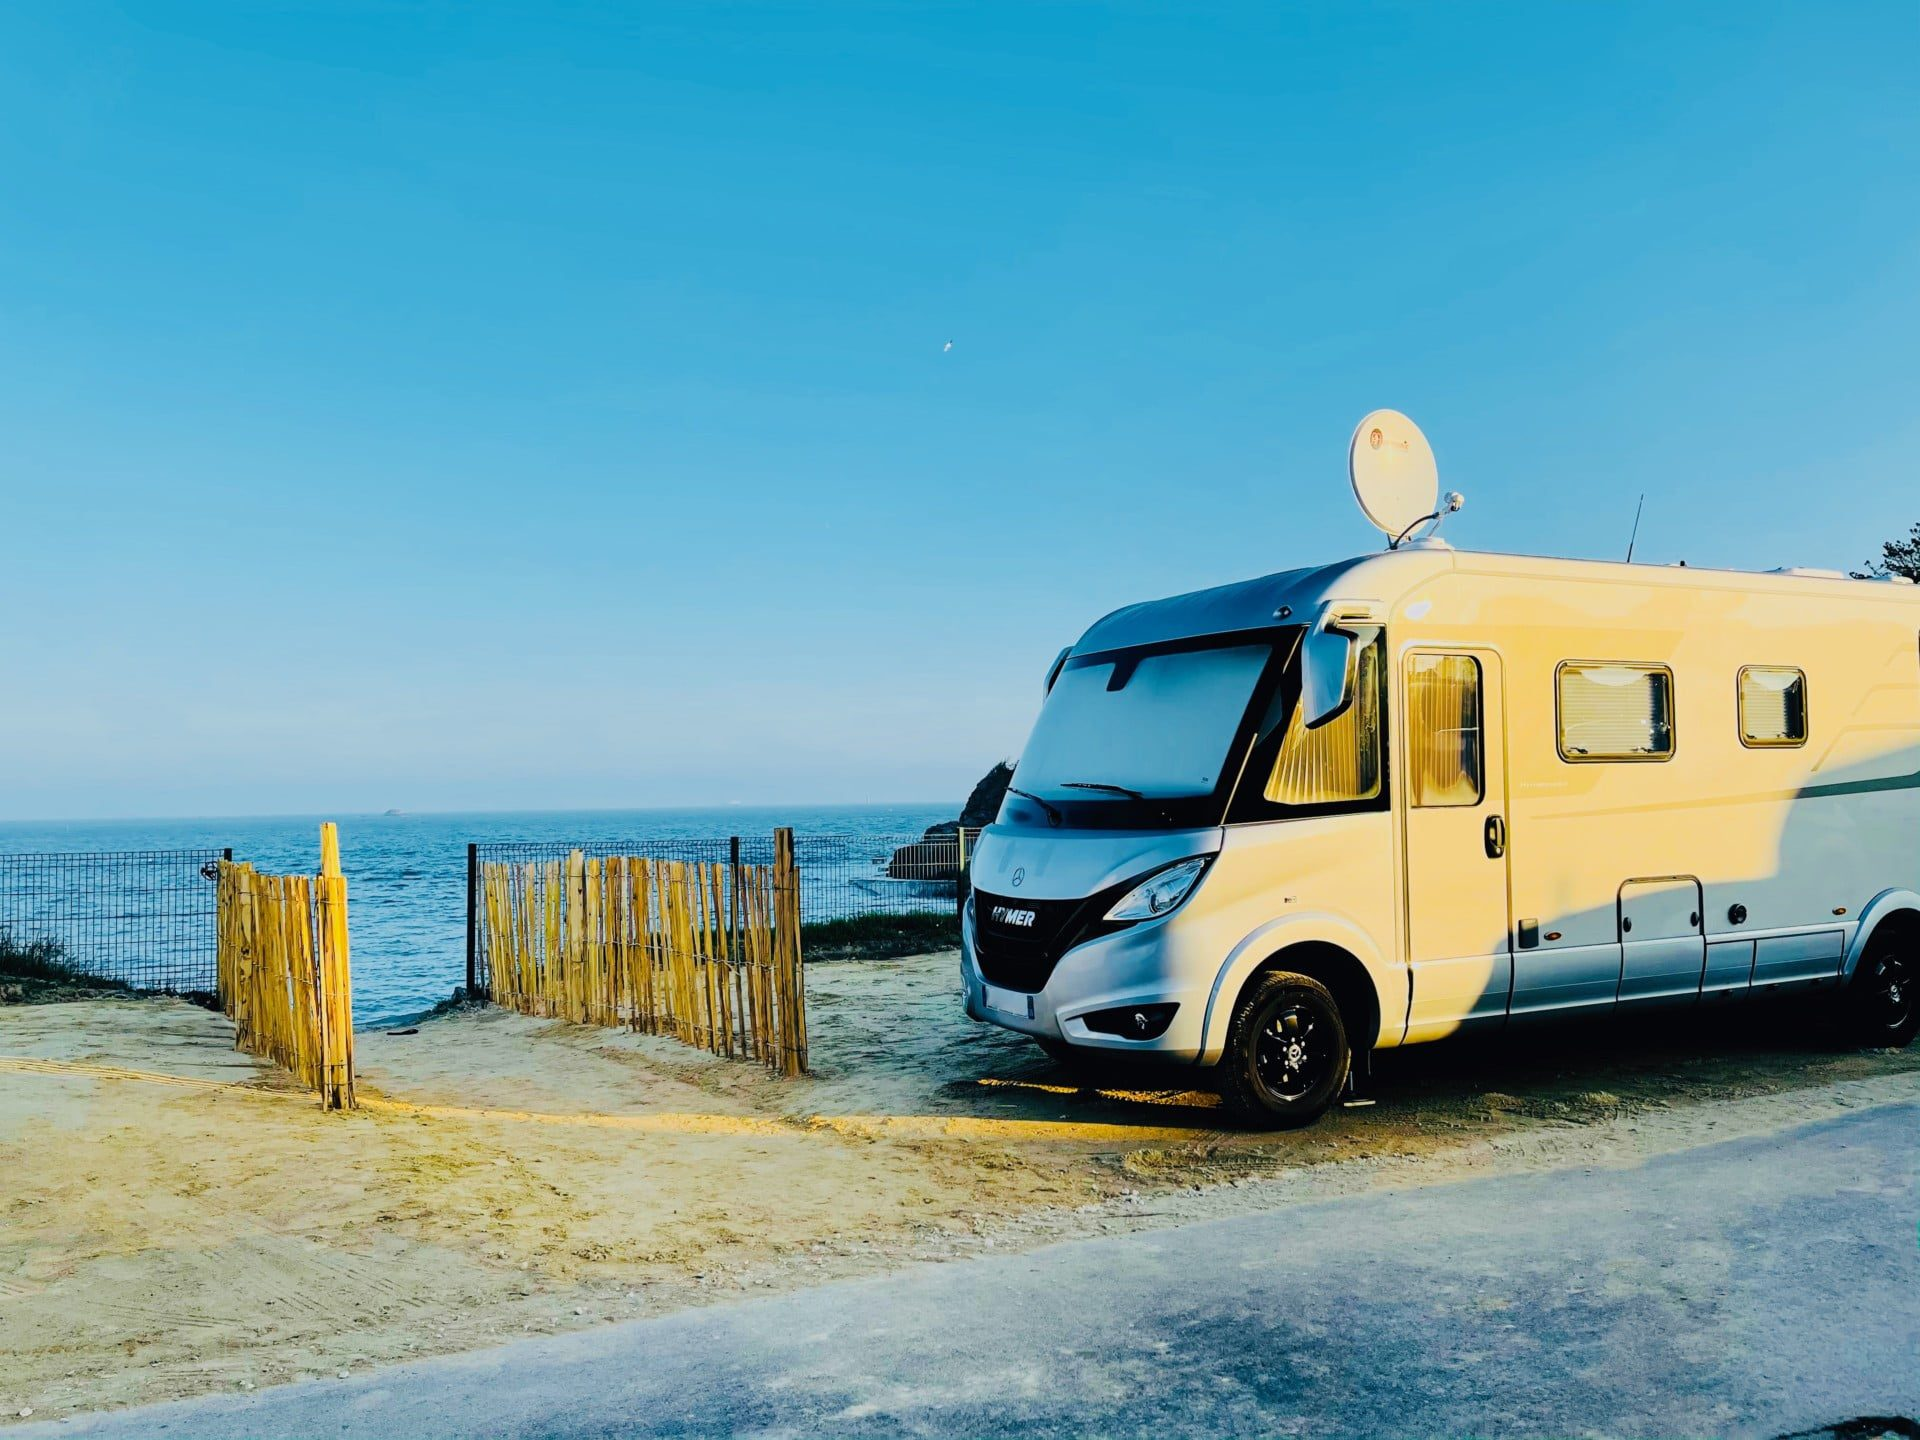 Camping-Port-Blanc-DINARD-Bretagne-CampingCar-Caravane-MobilHome-Vacances-Mer-1